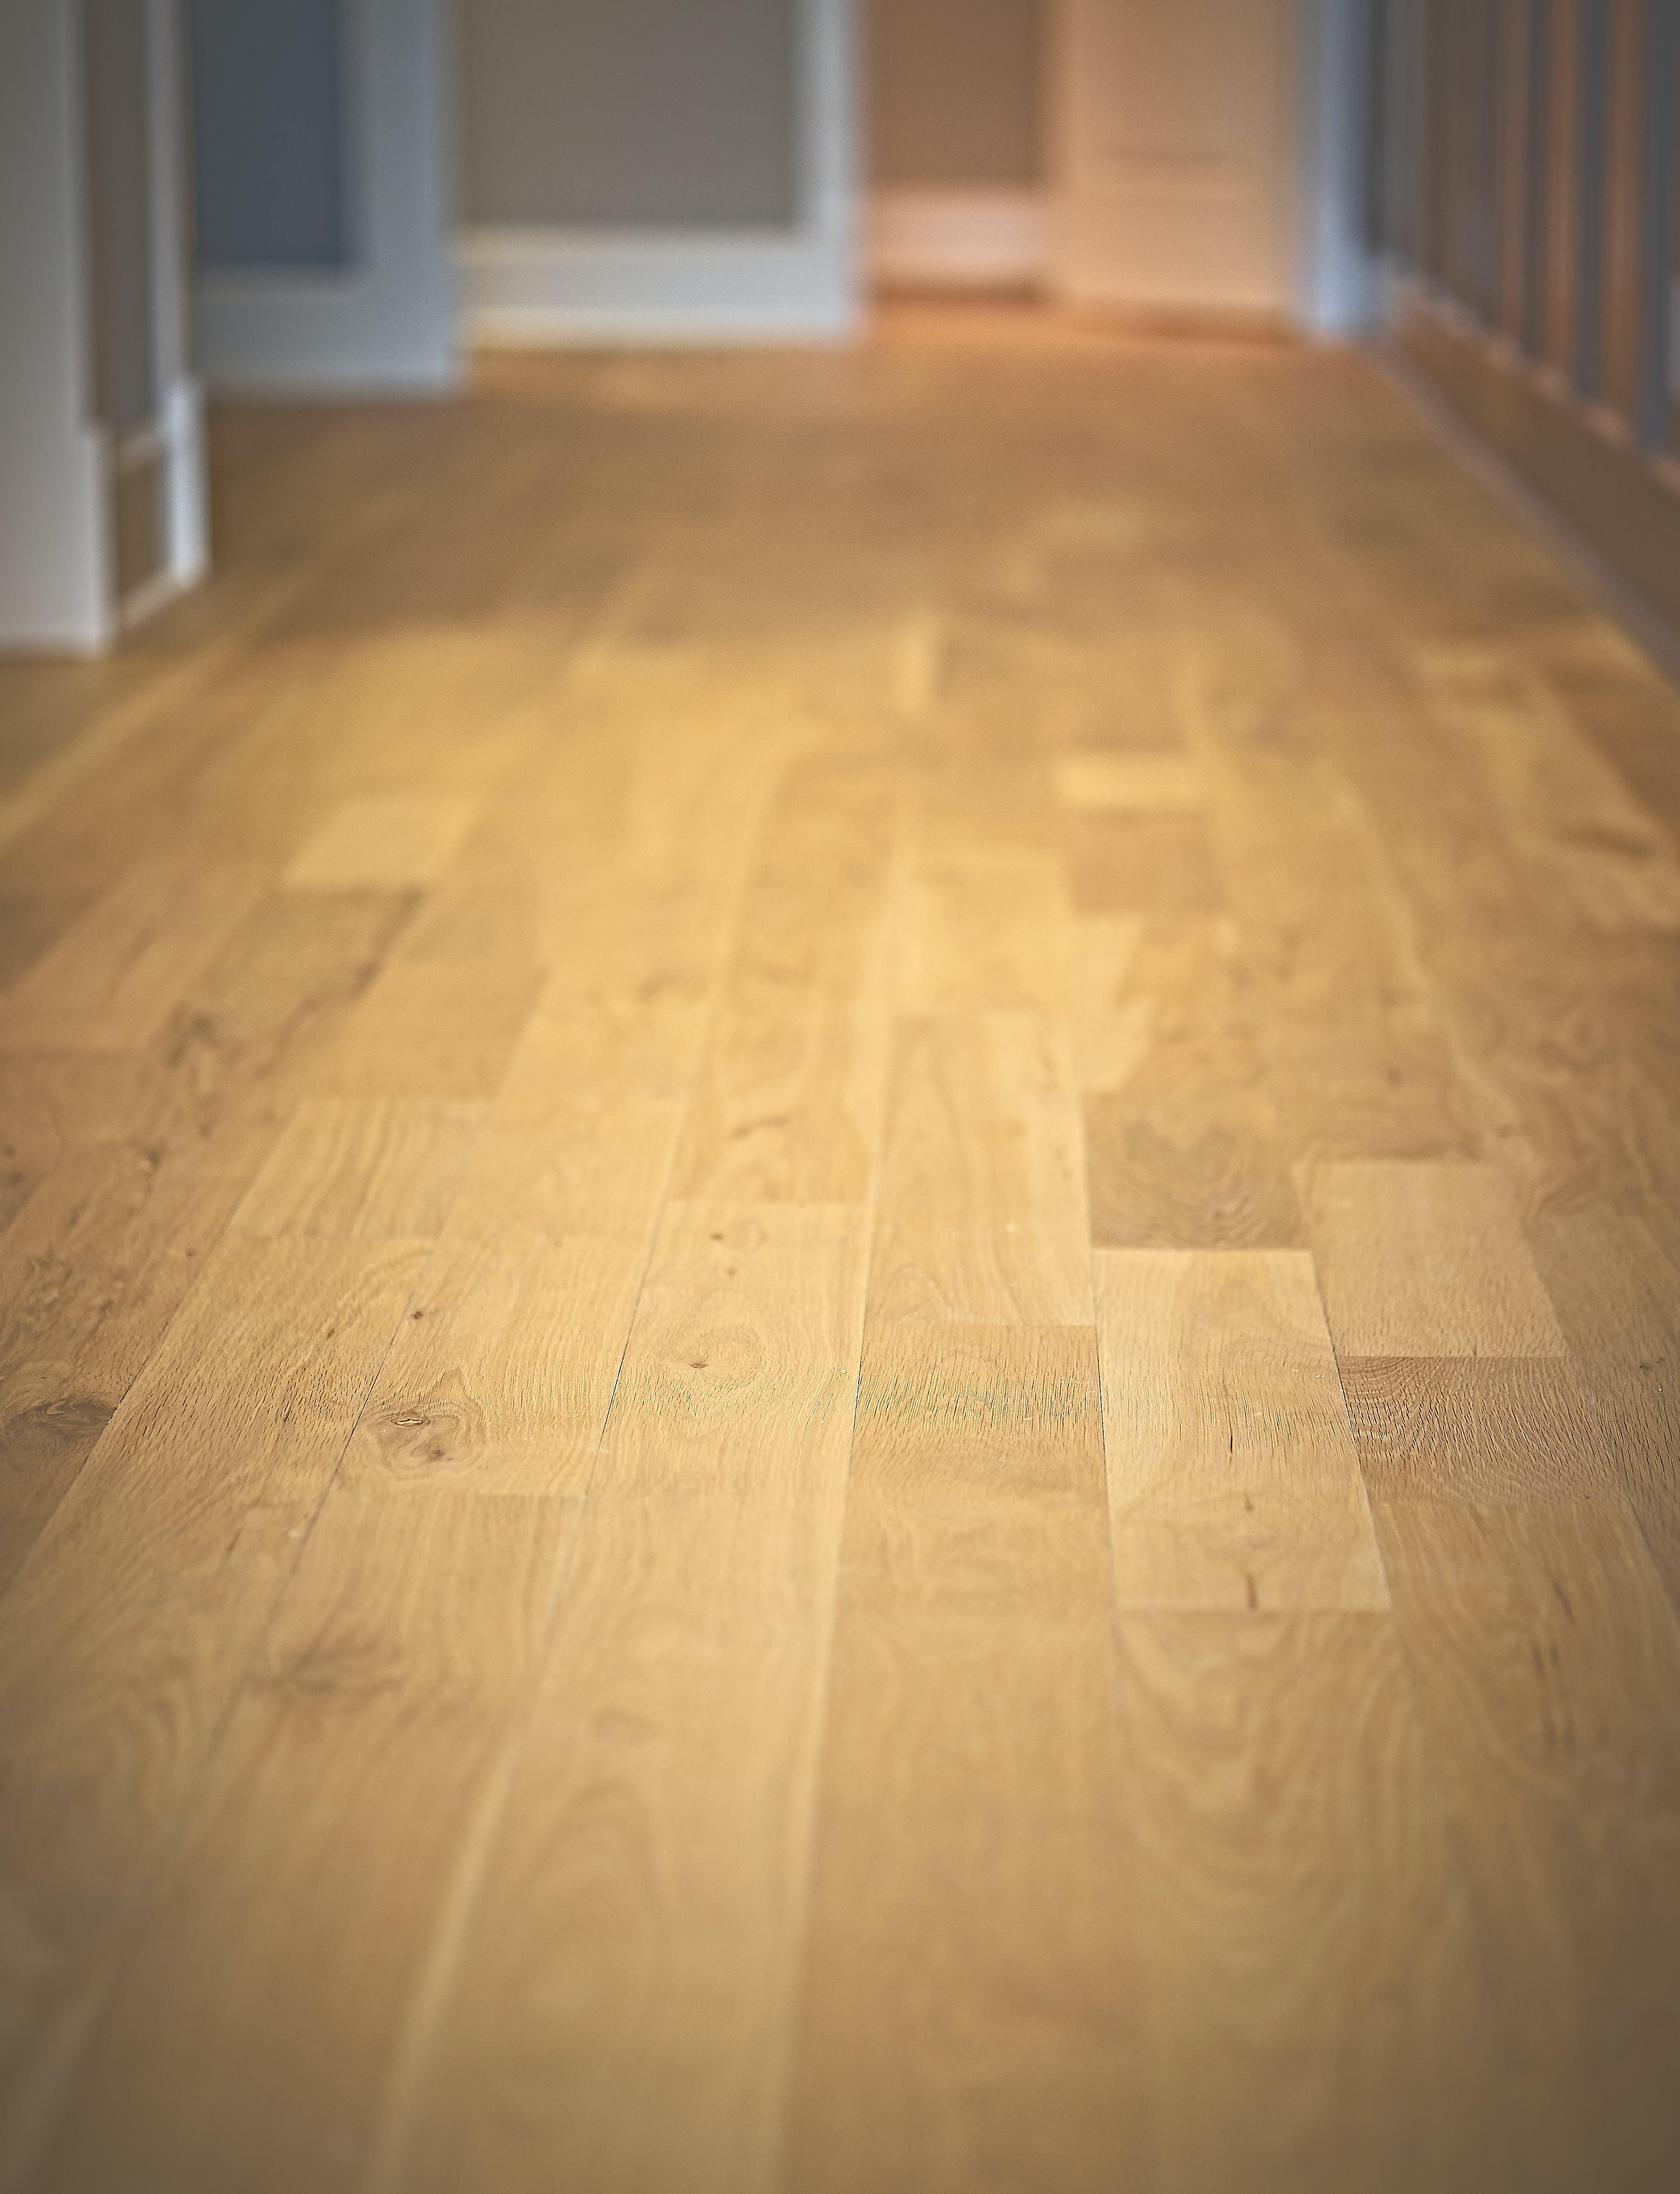 Free stock photo of hardwood floor, natural wood, engineered wood floor